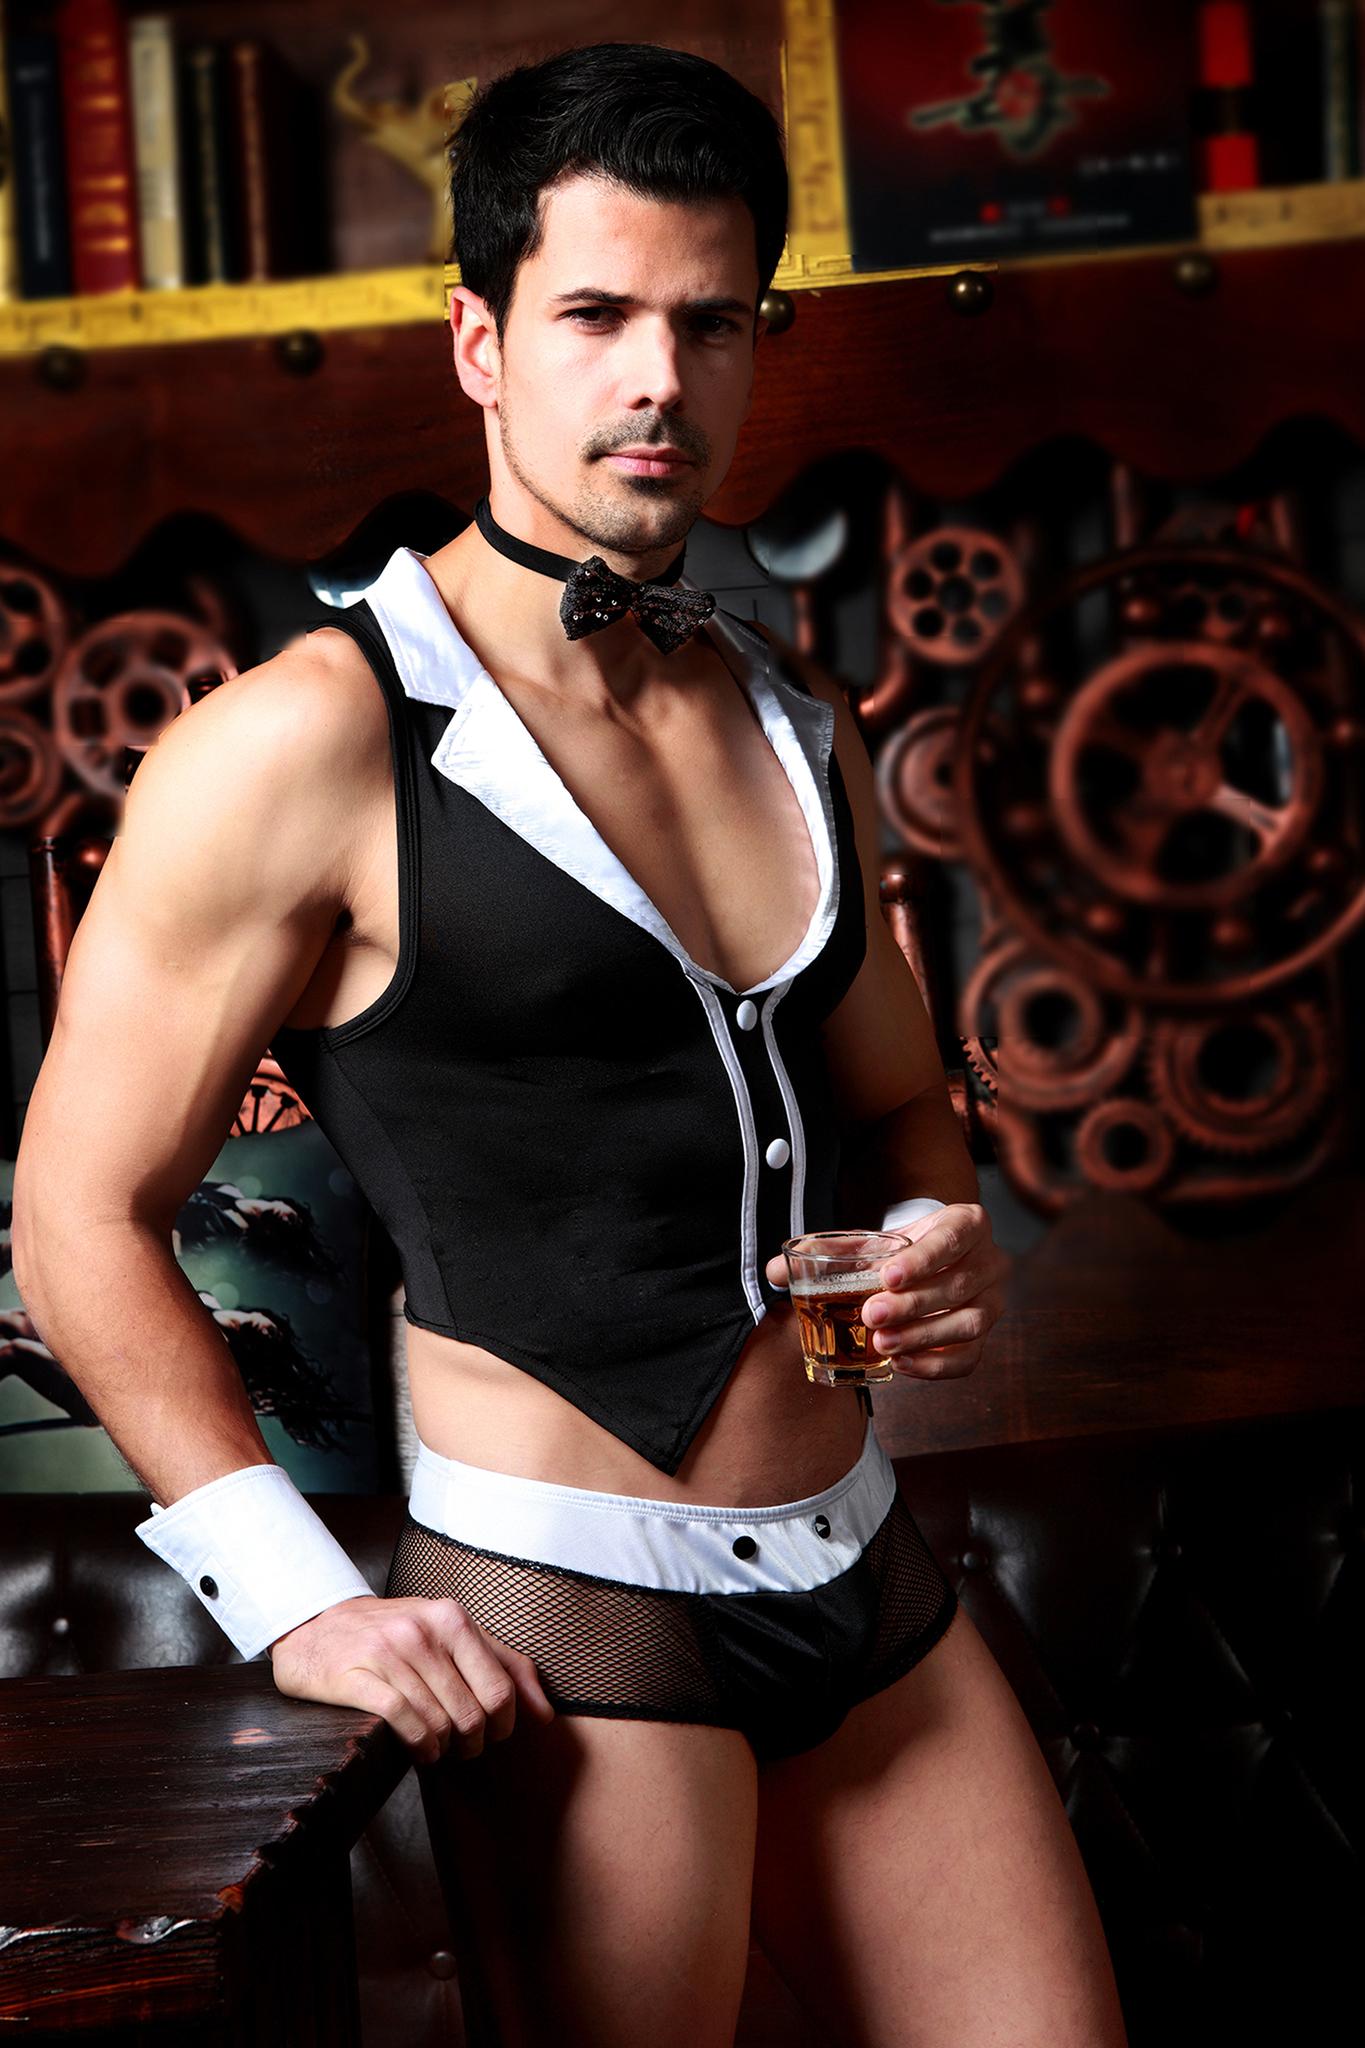 Костюм официанта Candy Boy Archer (майка, трусы, манжеты, галстук-бабочка) черно-белый, OS фото